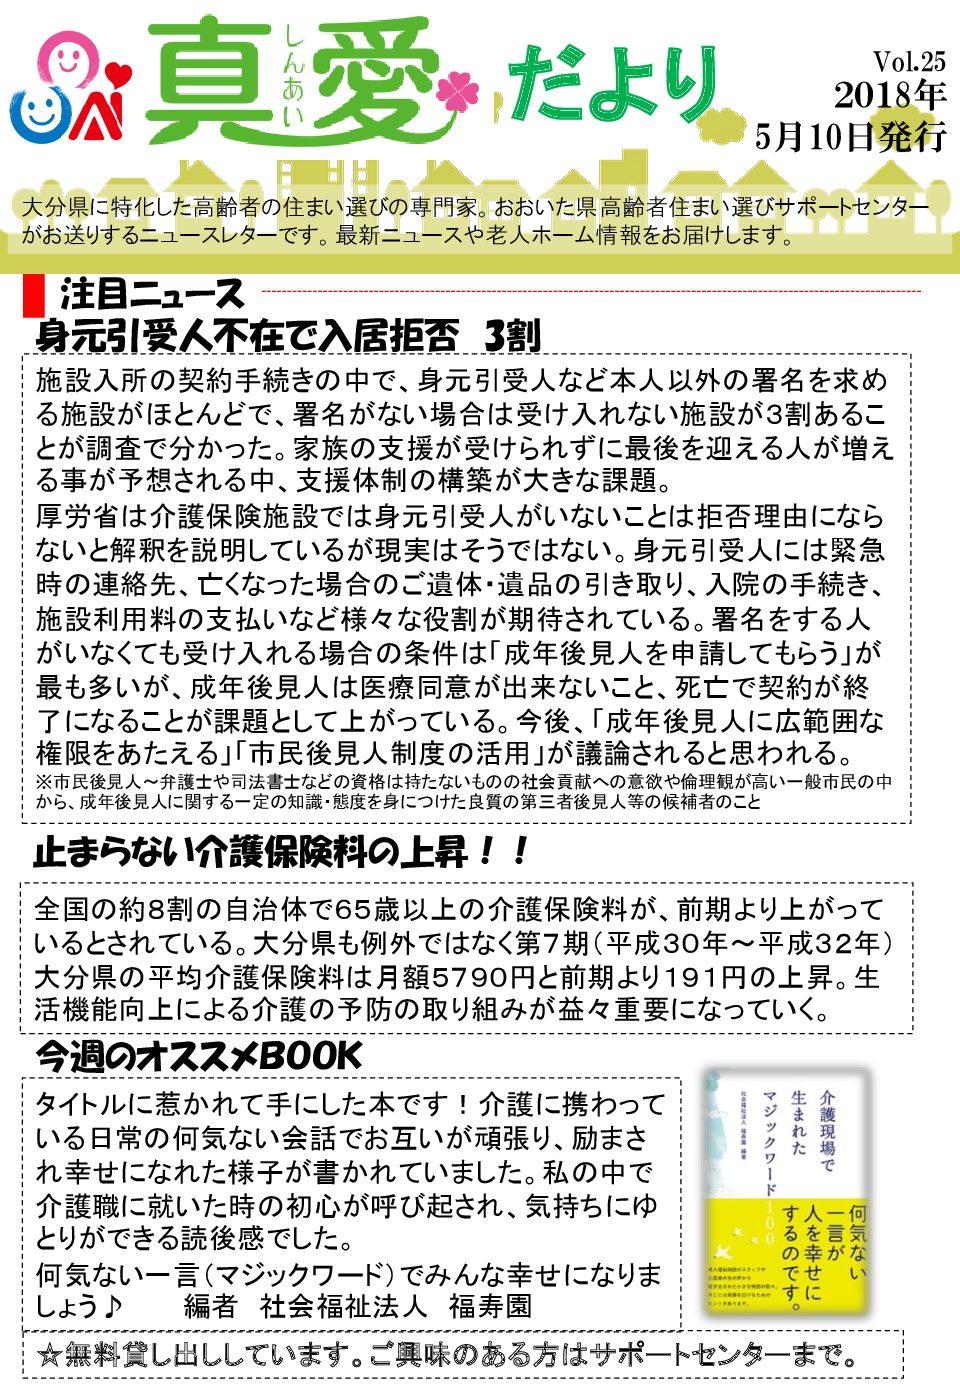 【Vol.25】 2018.05.10発行